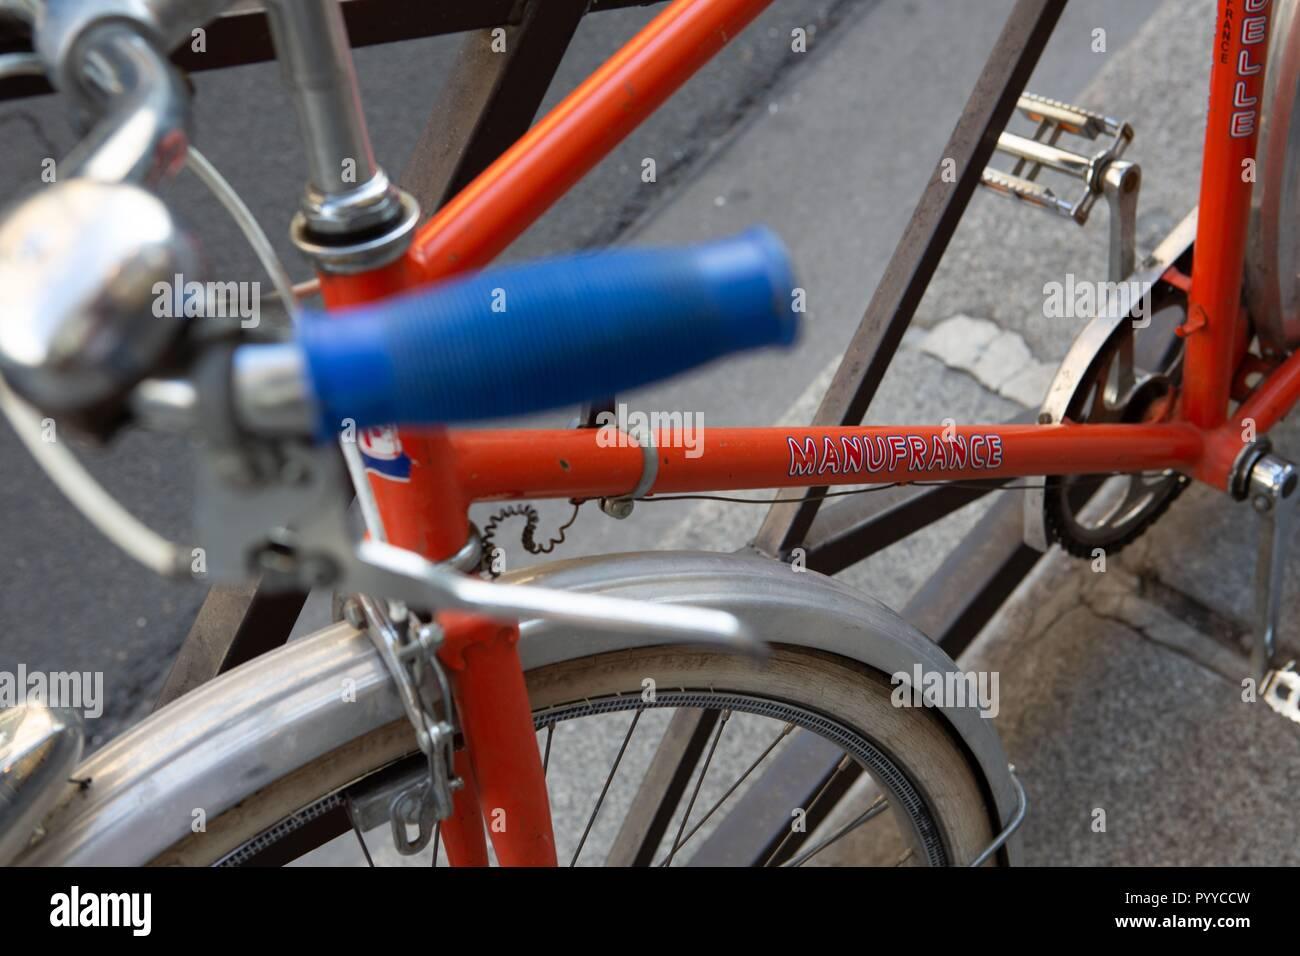 Ile De Re Cycling Stock Photos & Ile De Re Cycling Stock Images - Alamy